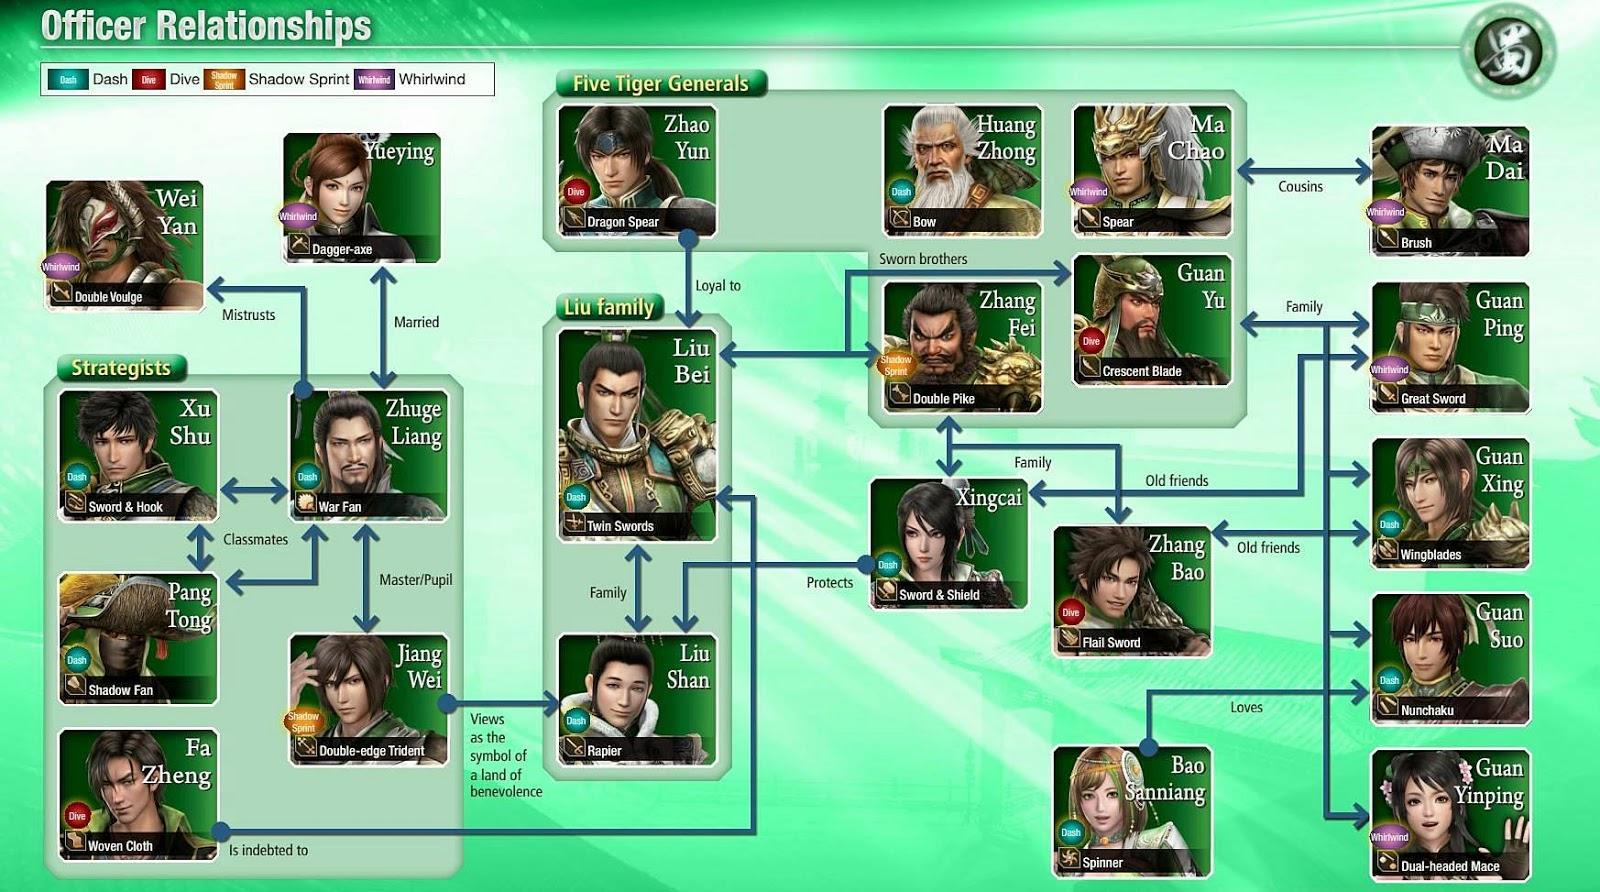 Officer Relationships DW8 : ความสัมพันธ์ของตัวละครสามก๊ก, จ๊กก๊ก